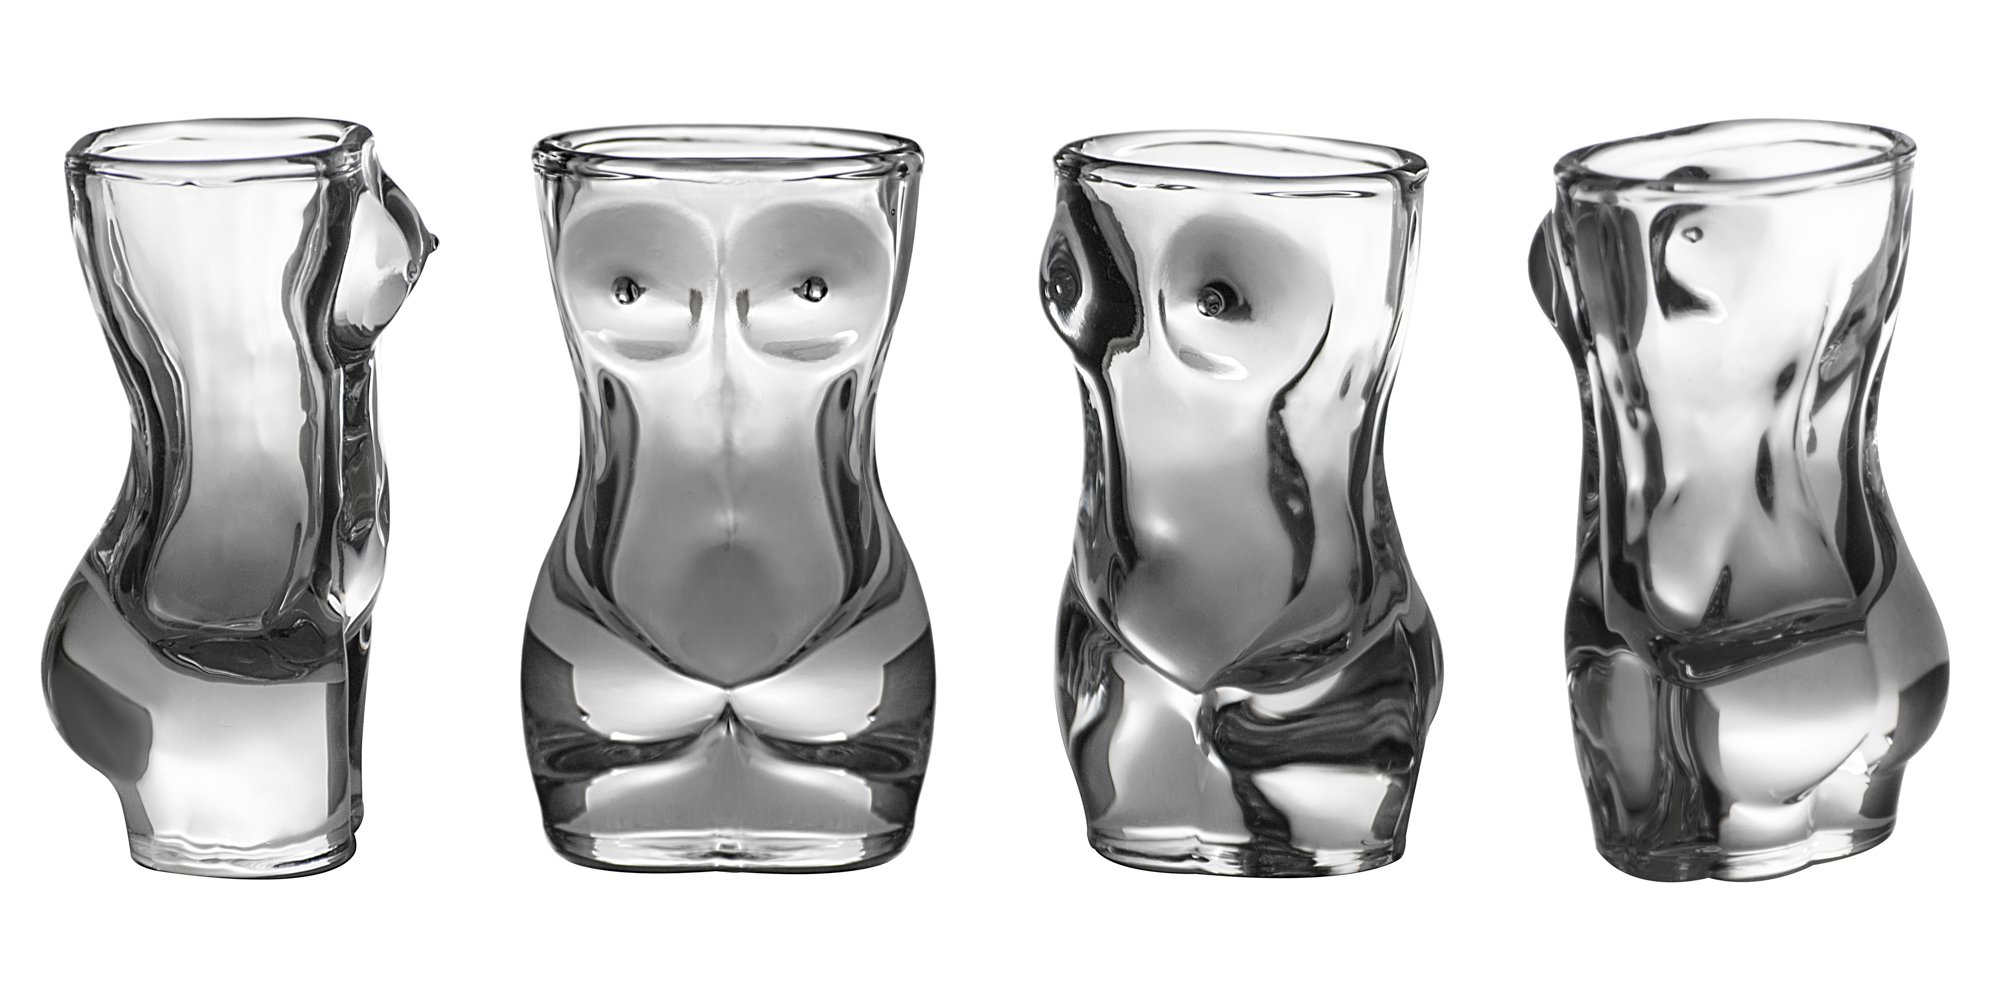 Shot Glass Set (4-Piece Set) Crystal, Women Shaped Custom Design | Bachelor or Bachelorette Party Drinks | Tequila, Vodka, Whiskey, Bourbon | Funny, Durable Style (FemaleV2)